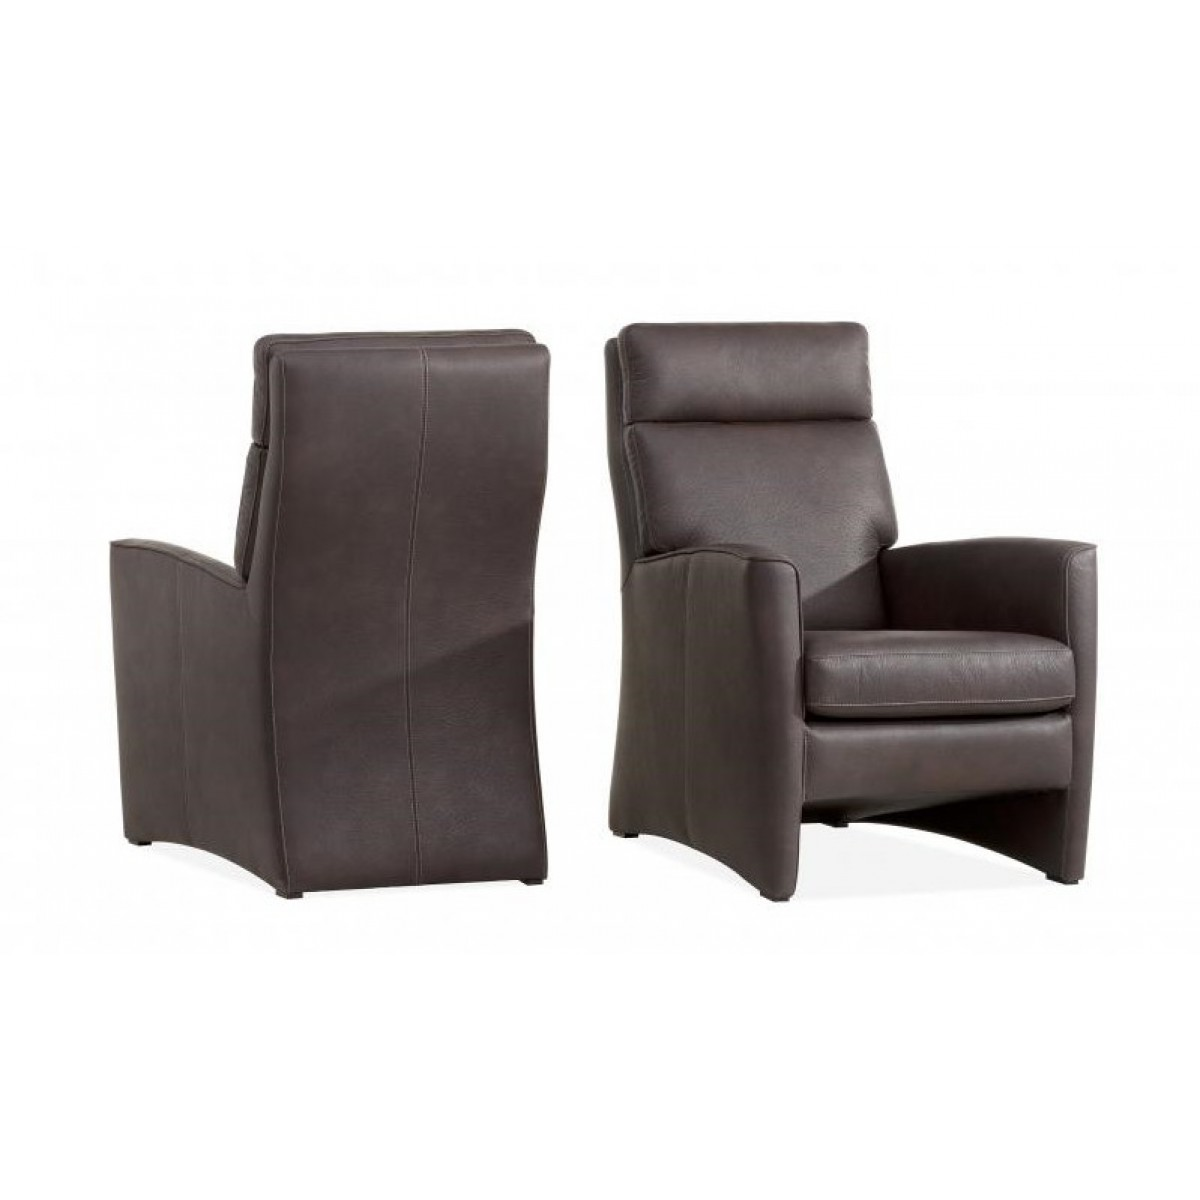 fauteuil-sherry-wiskey-stof-bull-maxfurn